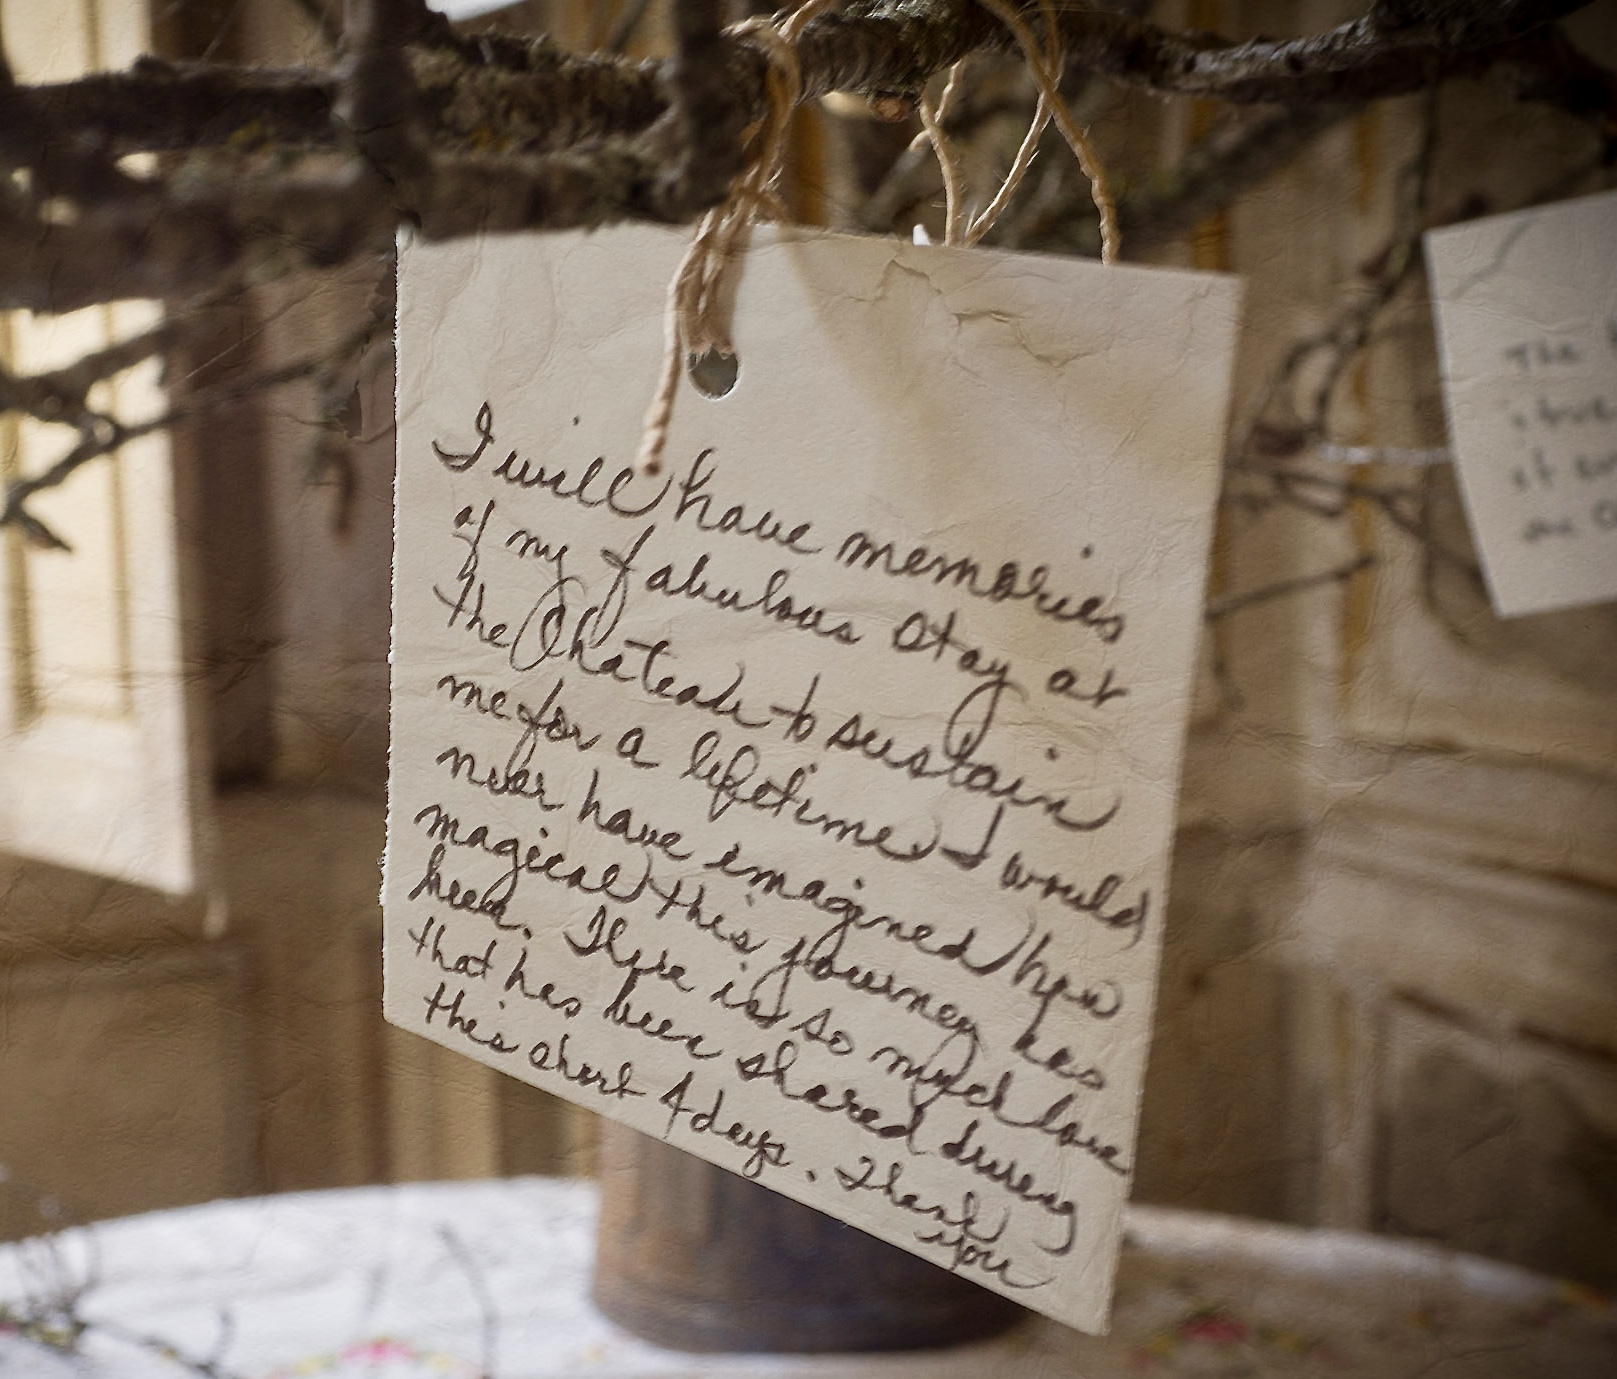 Photo of the Château Memory Tree taken by Betty Girardeau x